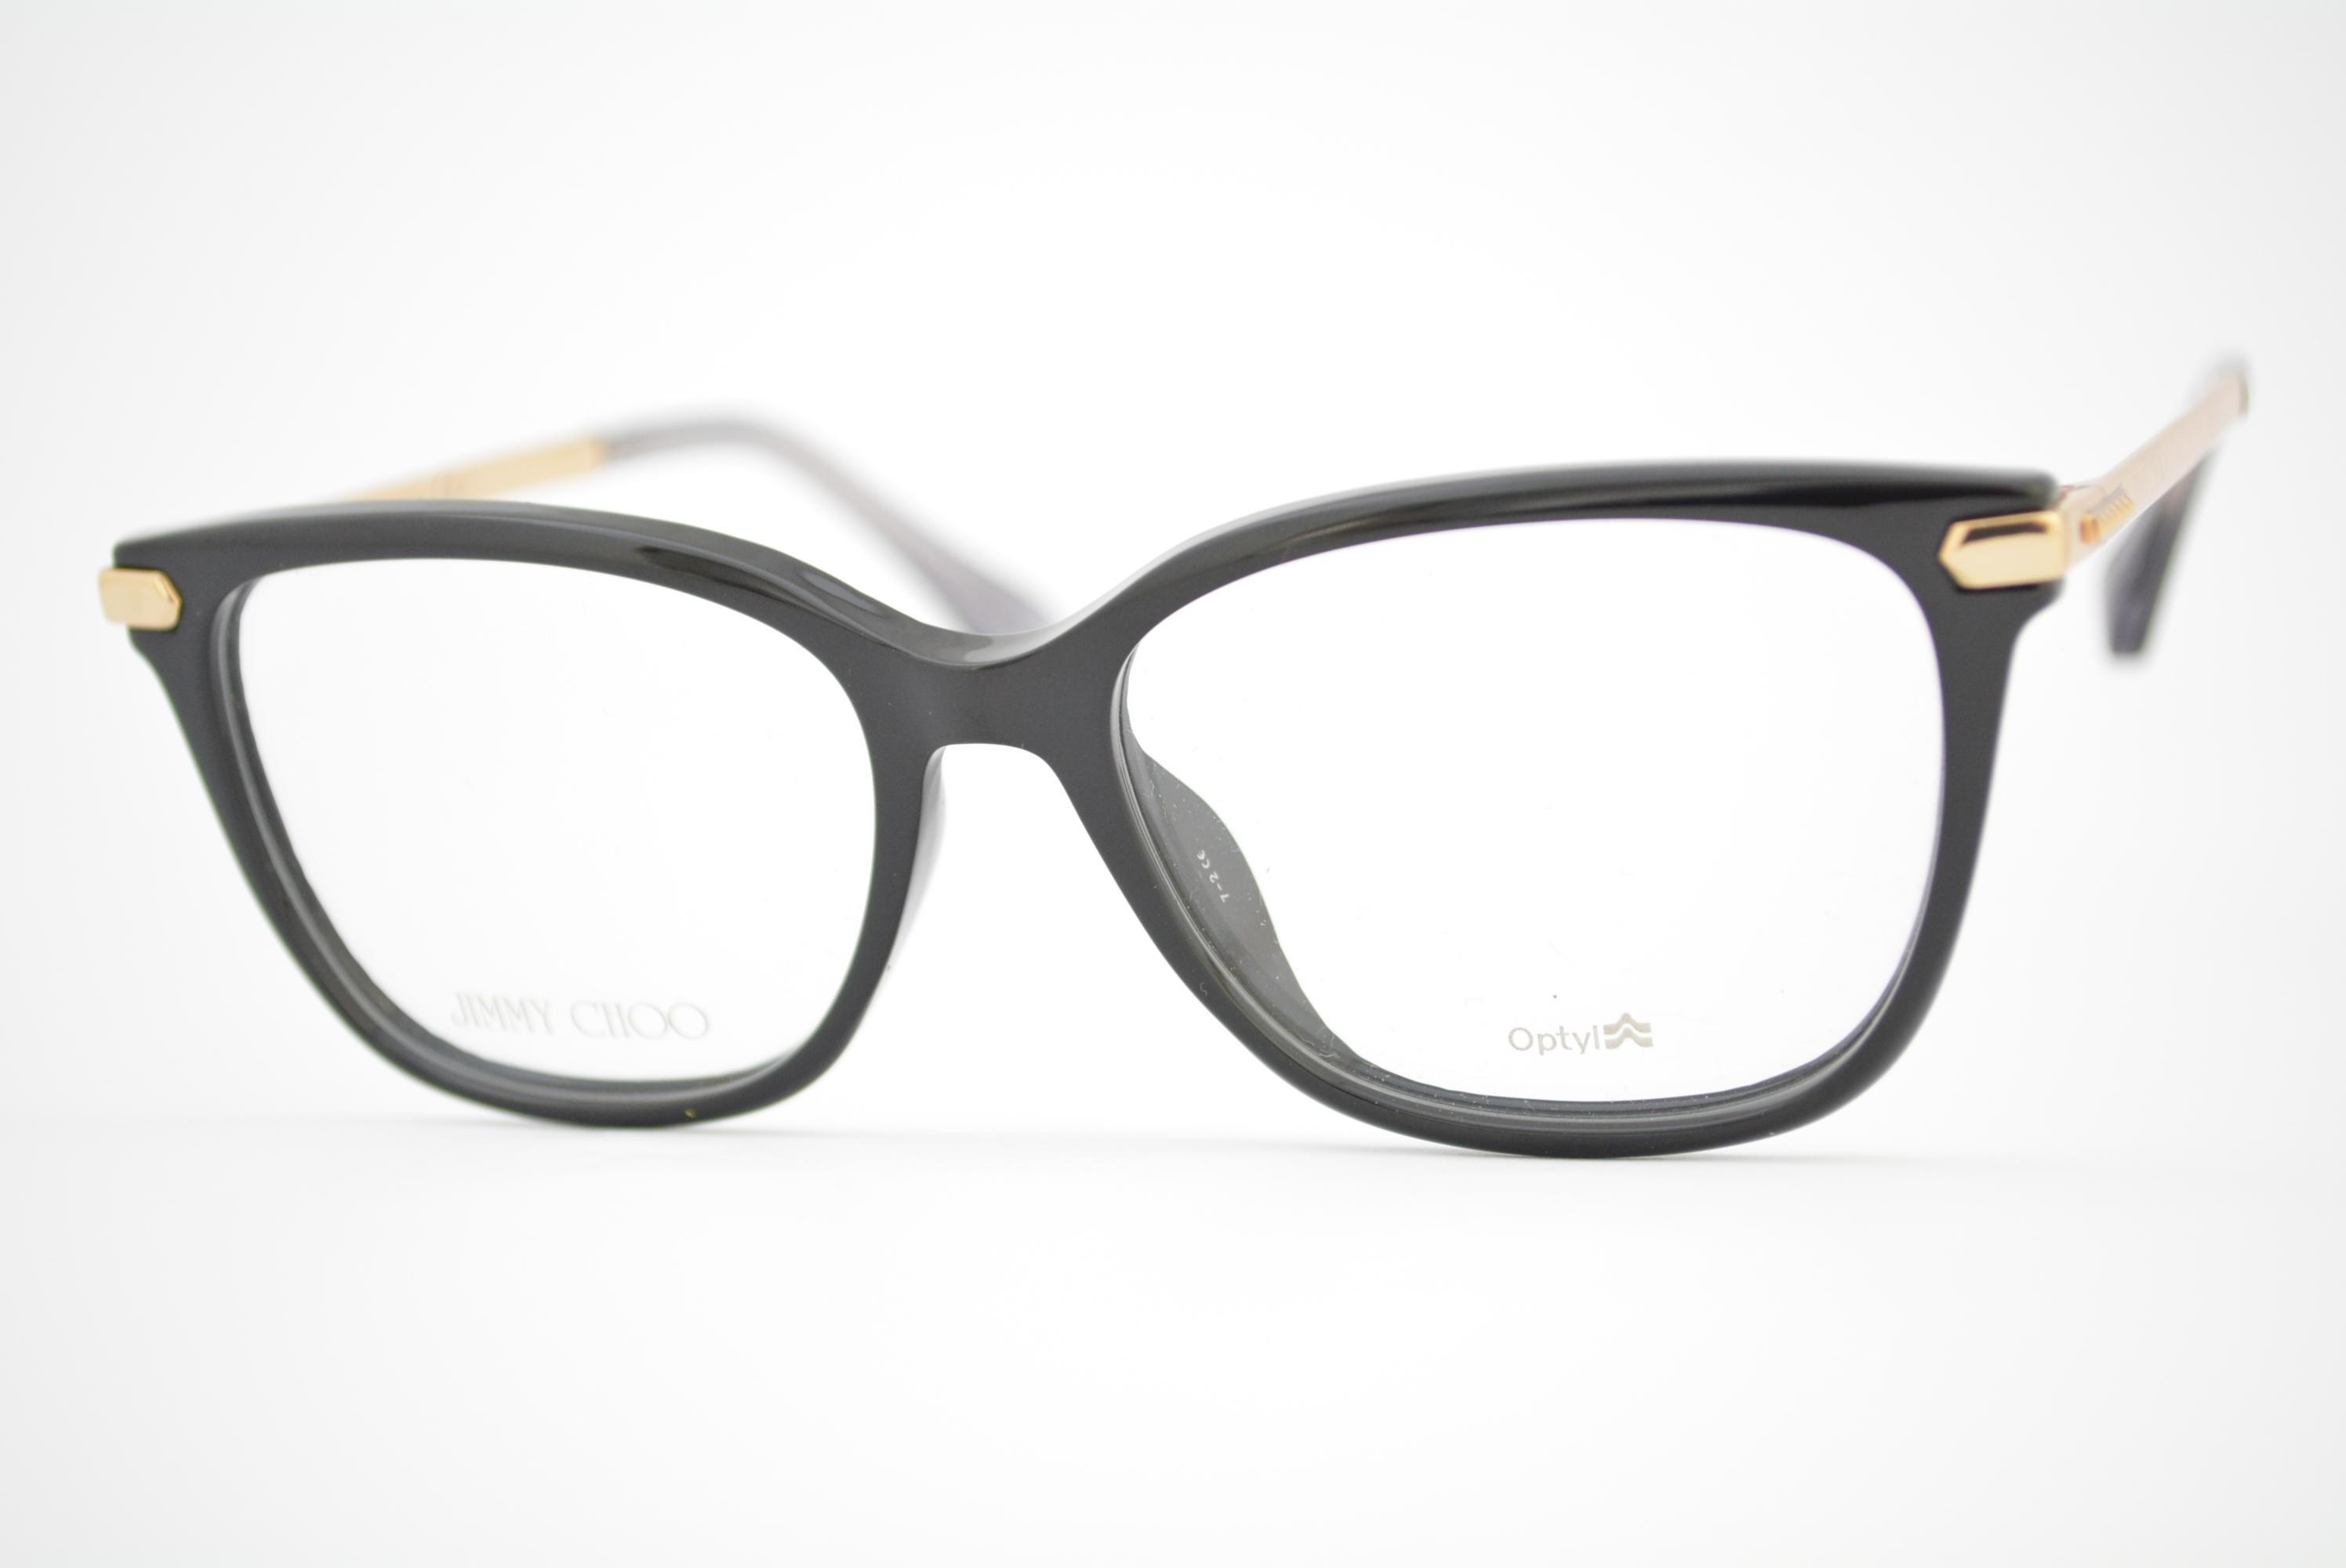 armação de óculos jimmy Choo mod jc174 N08